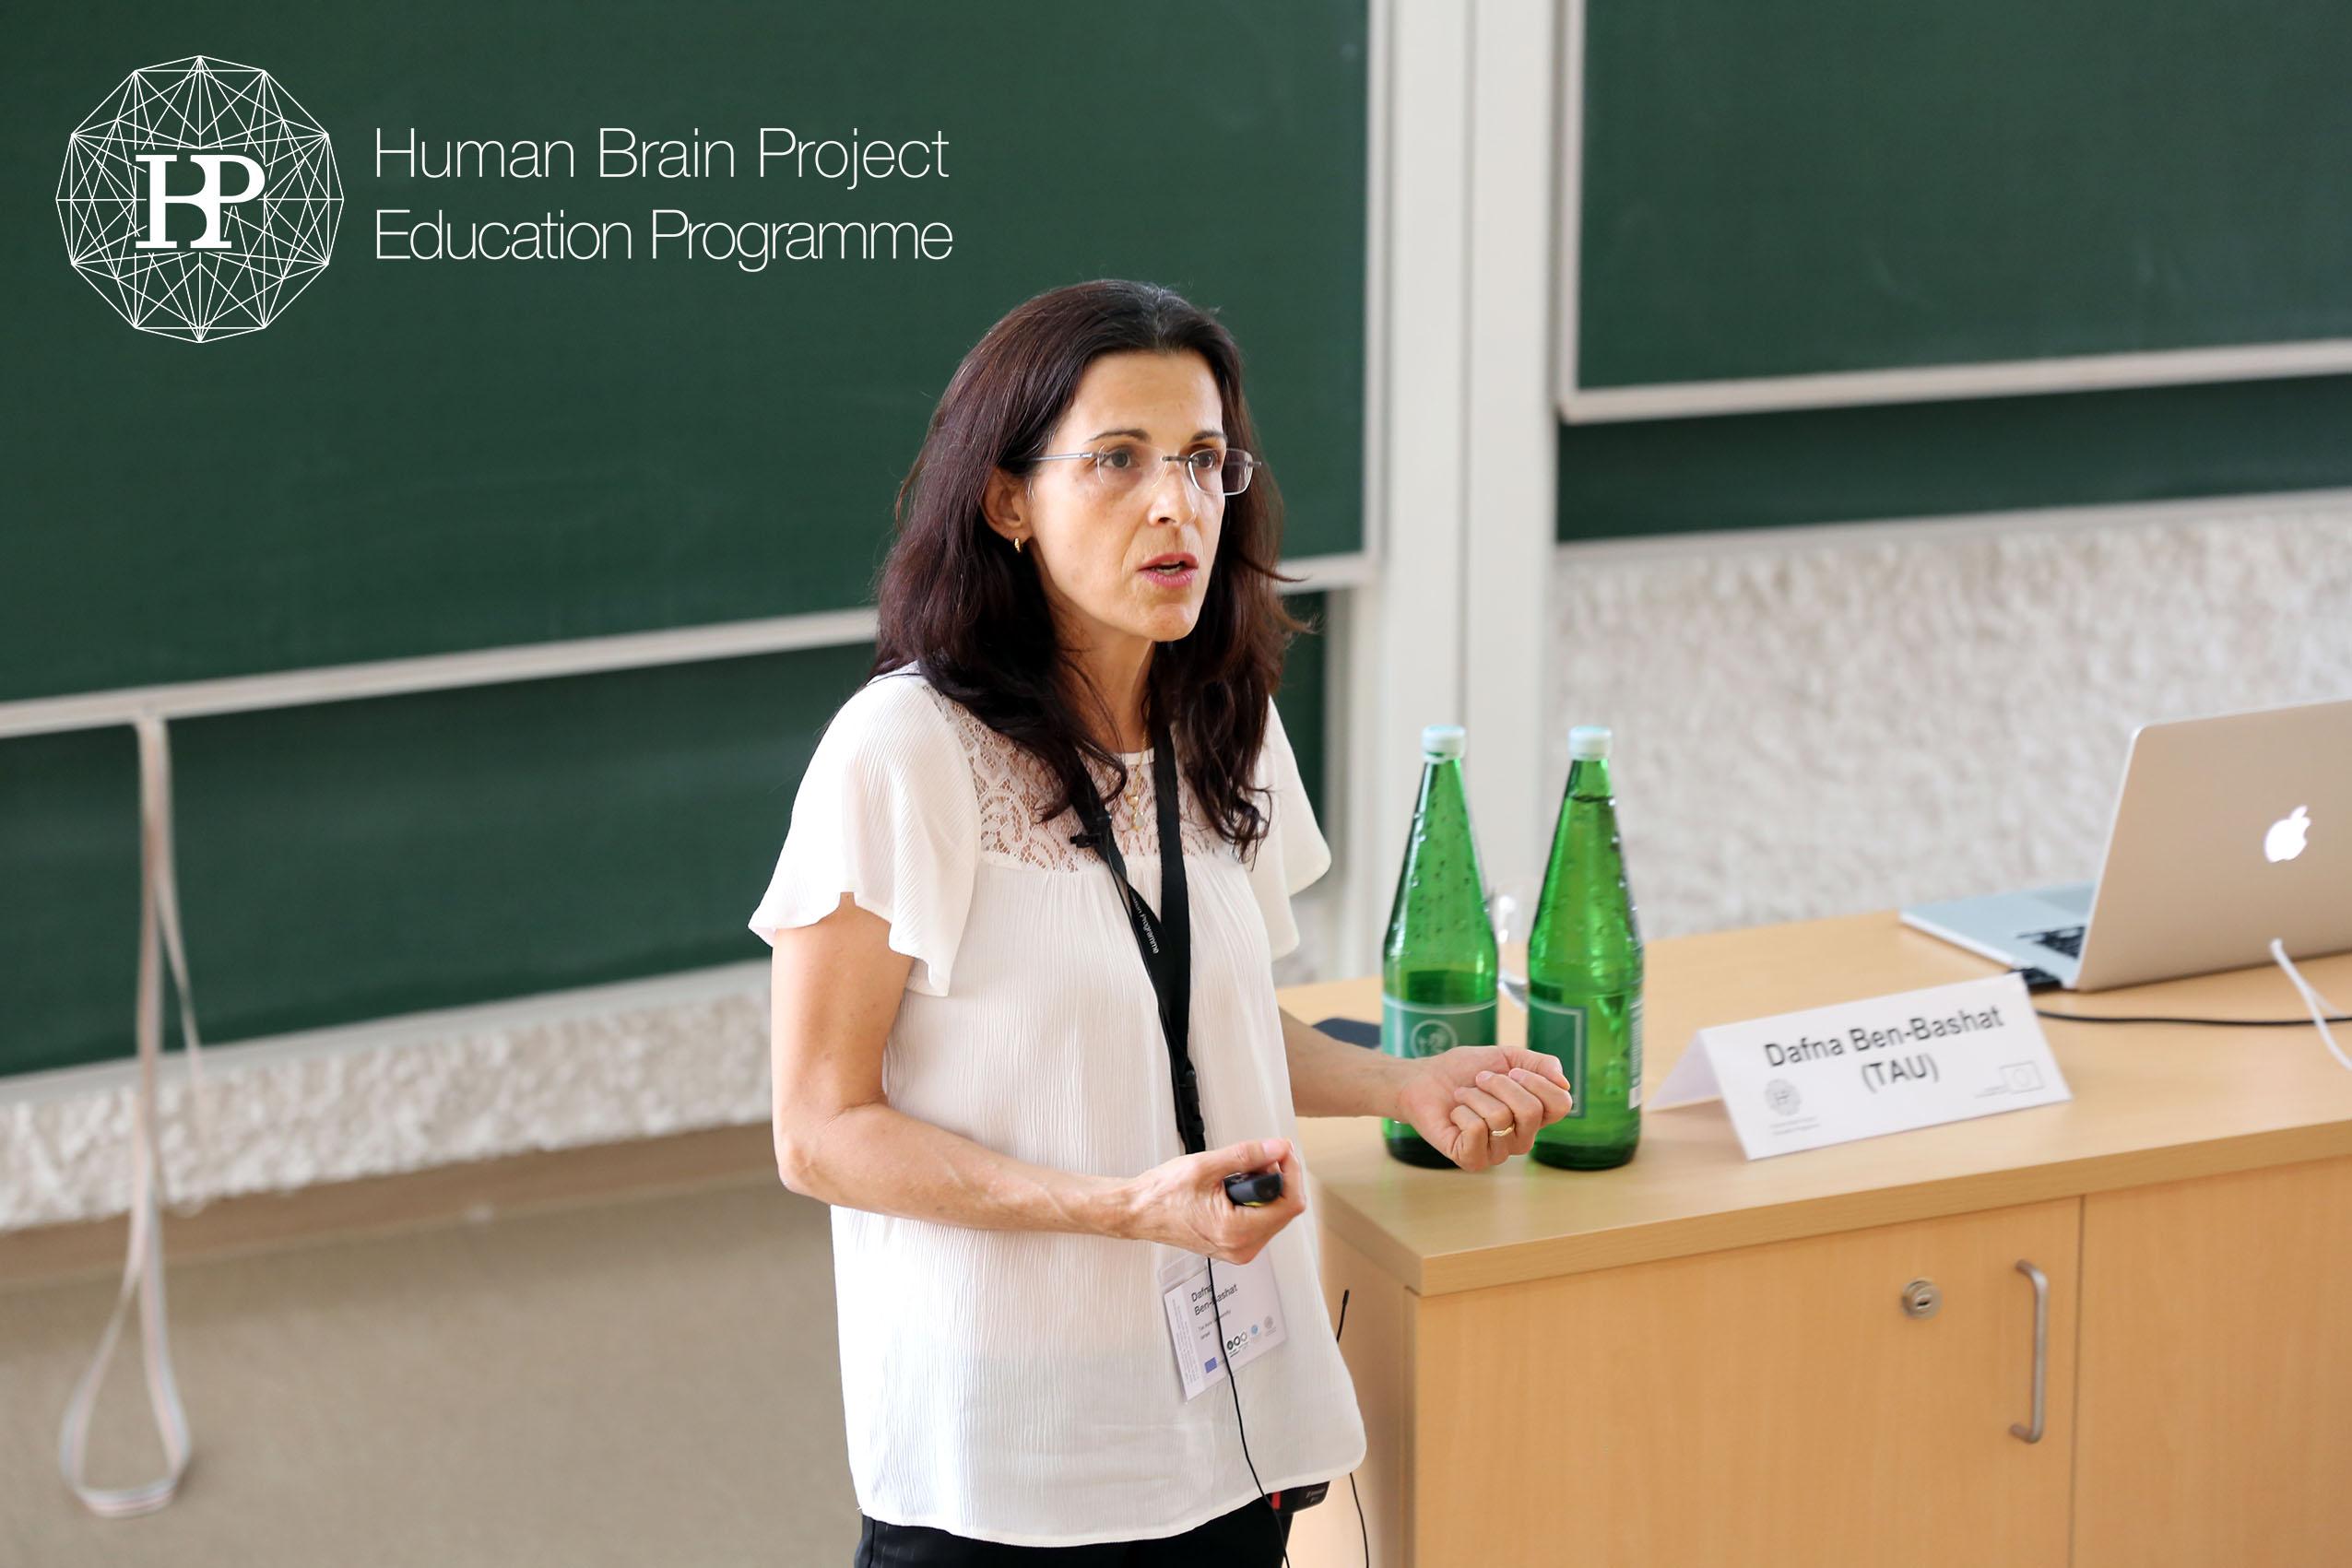 HBP_1st_BrainMedicine_workshop_19.jpg -